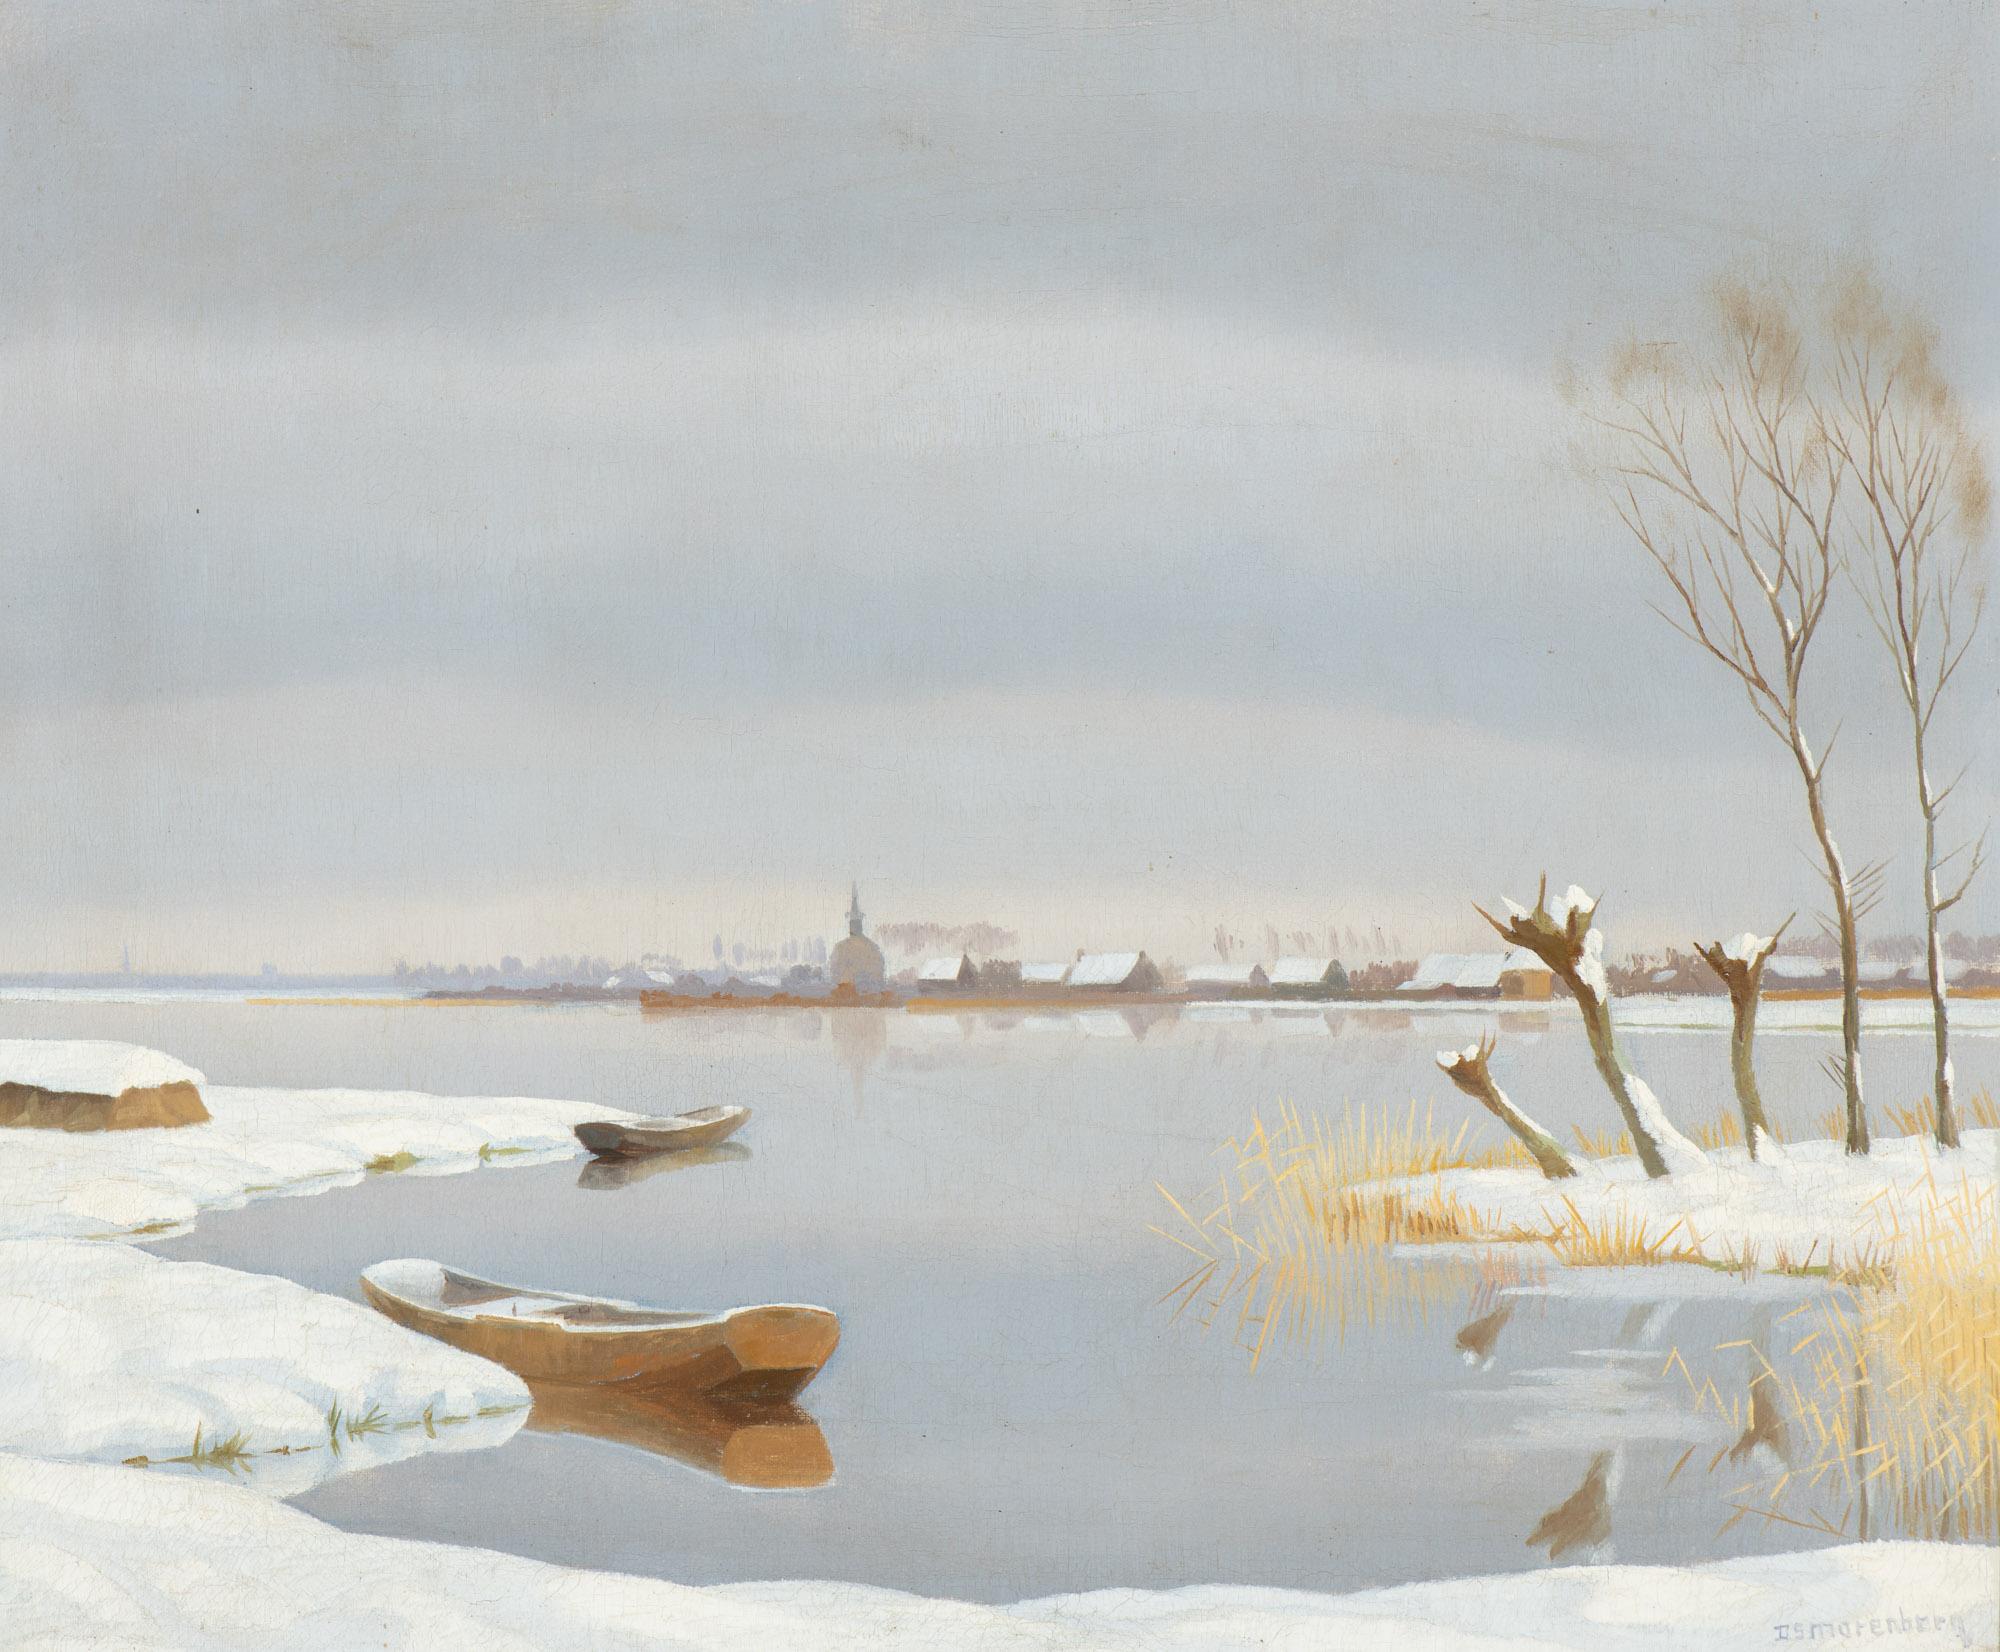 The Loosdrechtse Plassen in winter